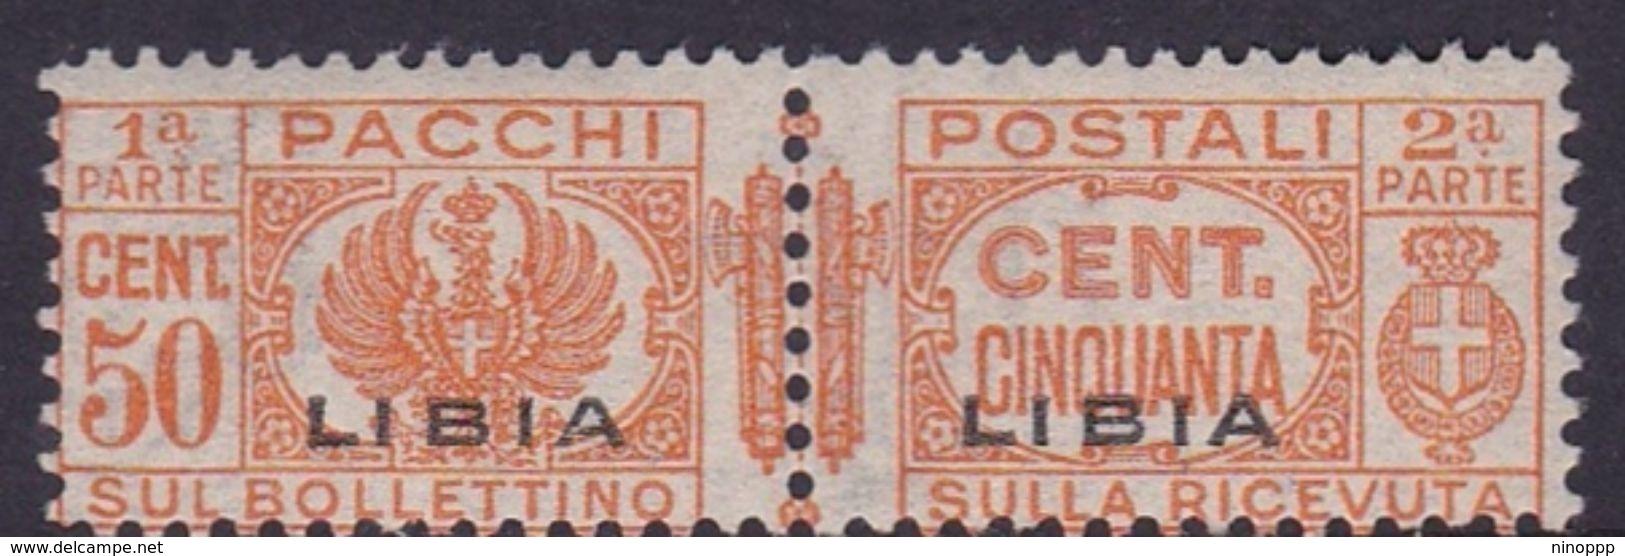 Italy-Colonies And Territories-Libya PP 5 1915-24 Parcel Post,50c Orange, Mint Hinged - Libya